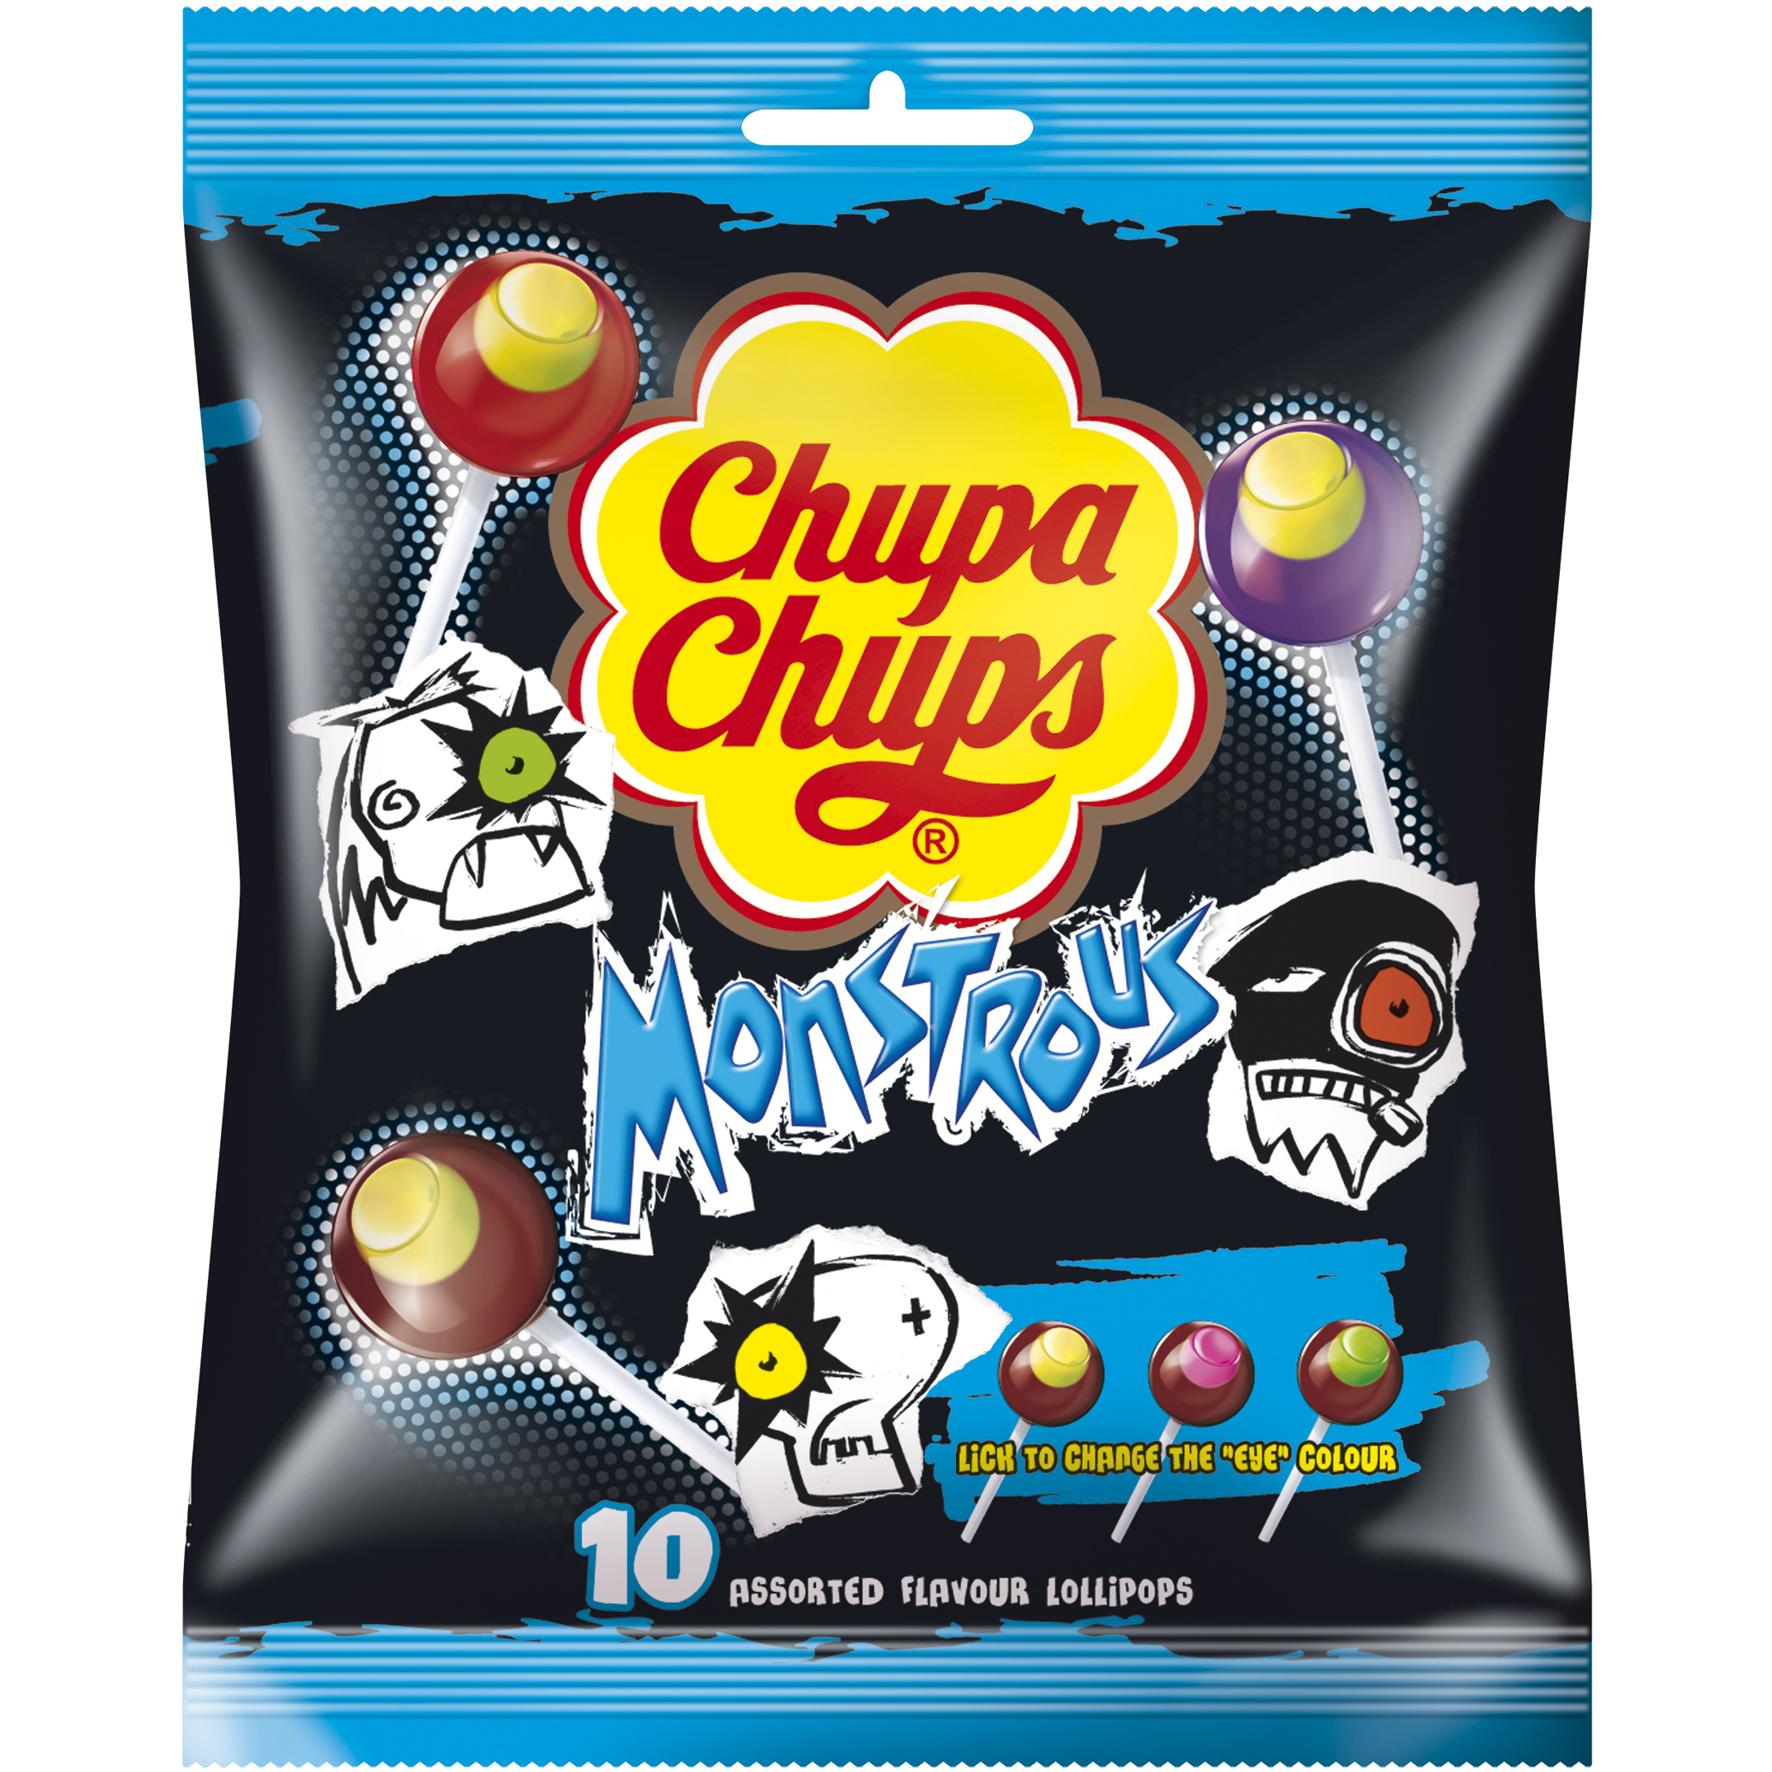 Chupa chups monstrous 10er online kaufen im world of sweets shop - Housse de couette chupa chups ...